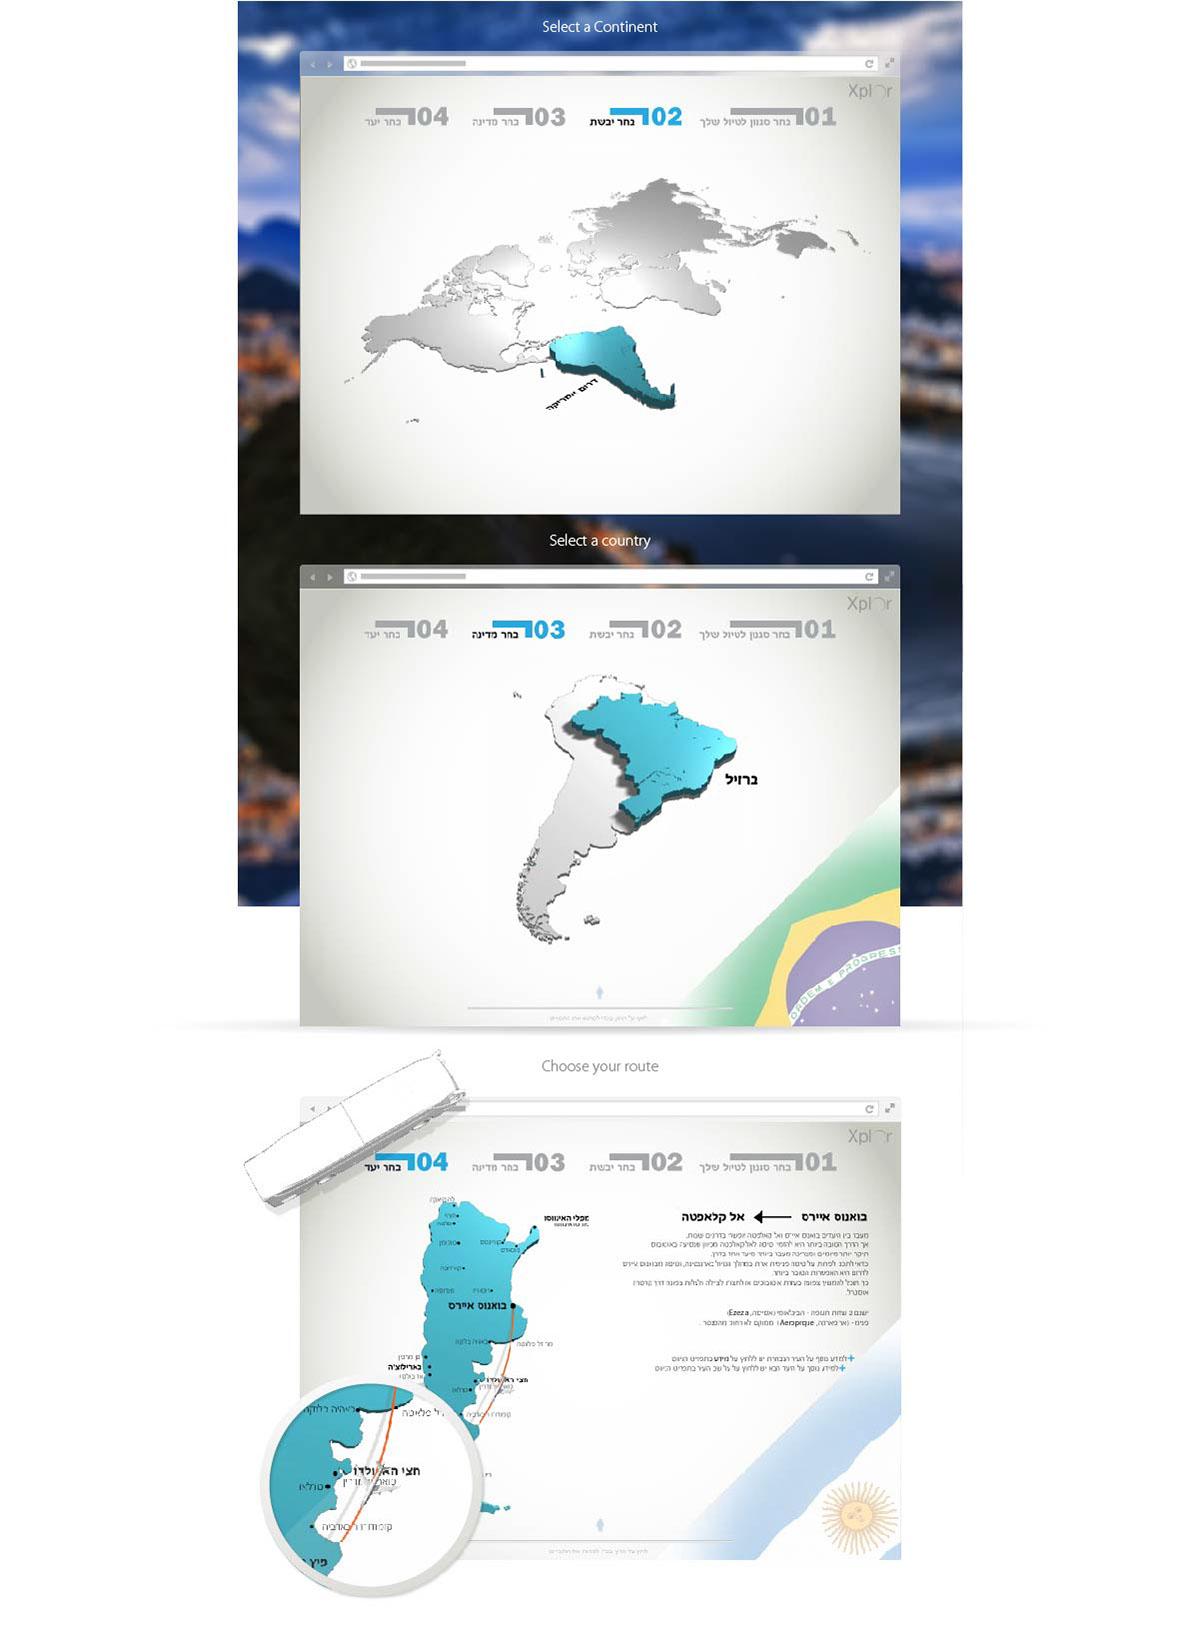 Web Design ,UI/UX,interactive design,Flash,xplor,Backpackers